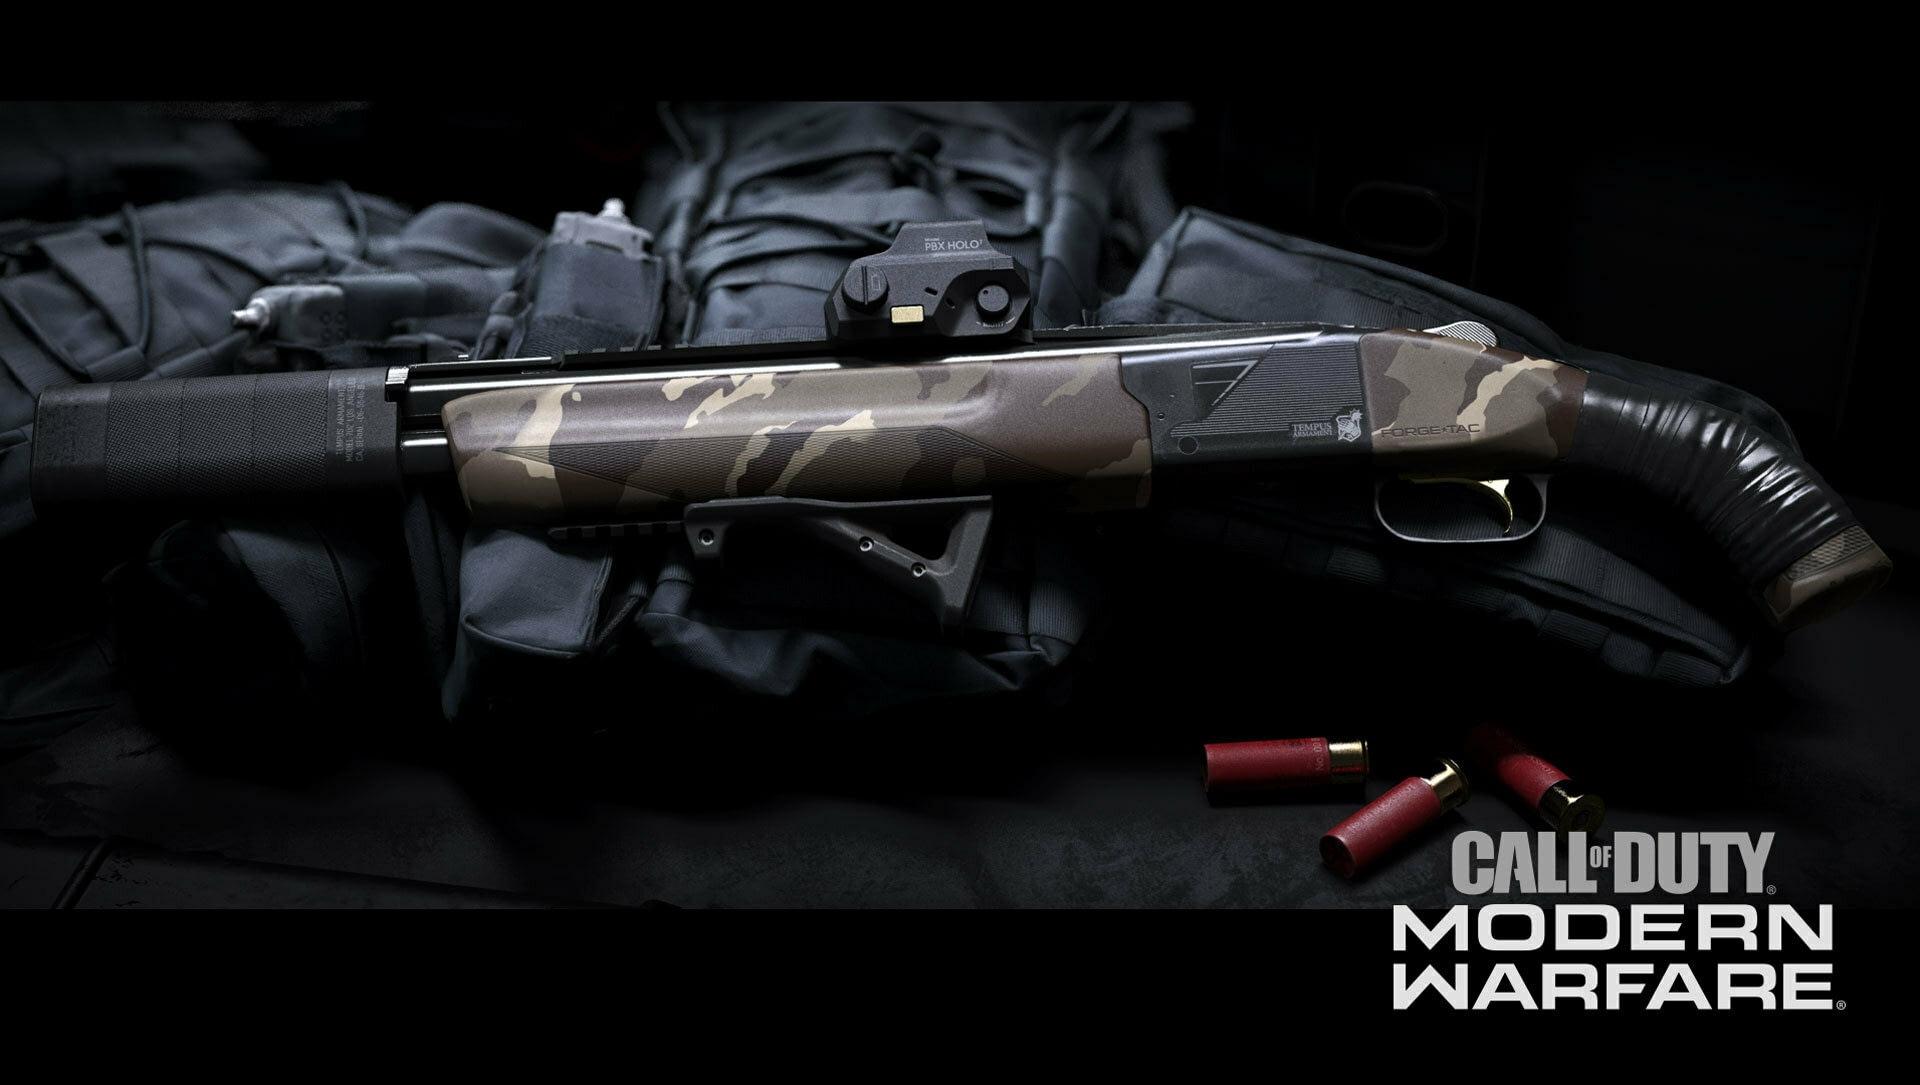 1t6JtP4KLoQ - Call of Duty: Modern Warfare - Эксклюзивный скин за участие в Бете